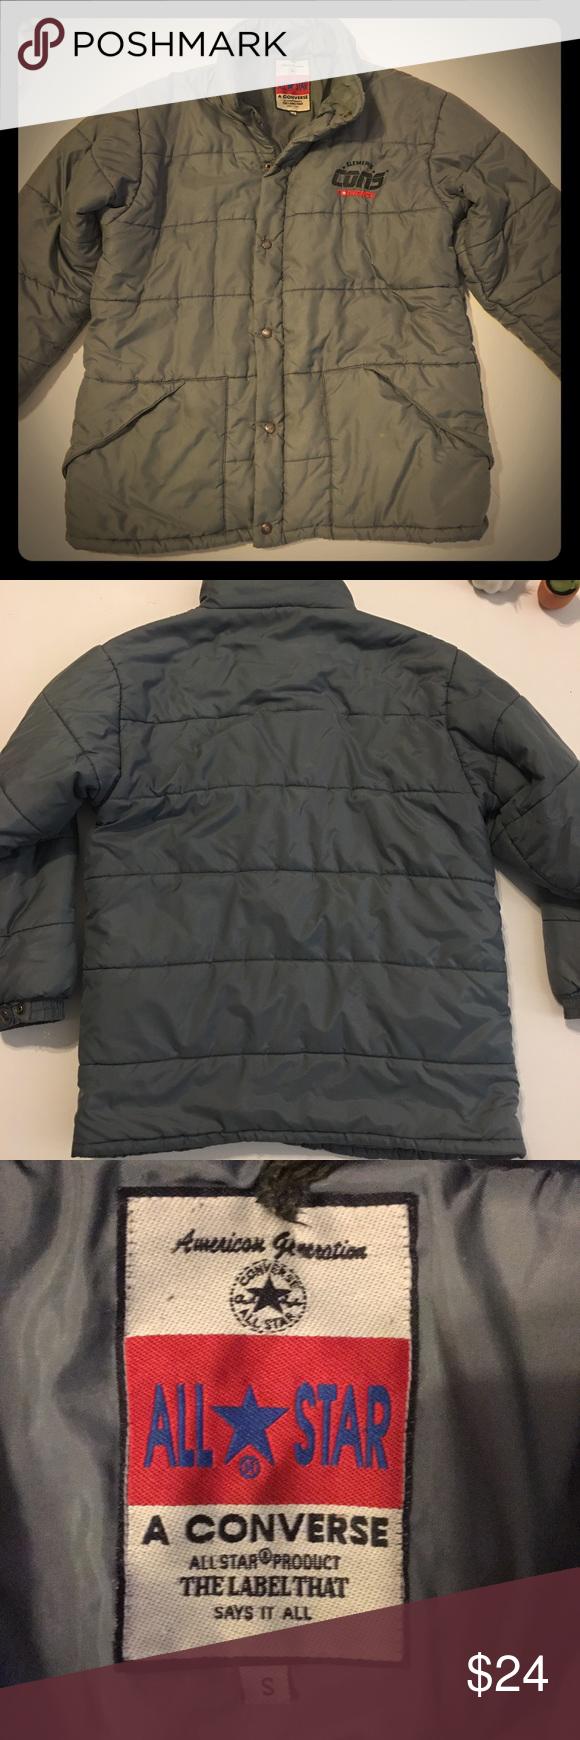 Converse VTG. all star jacket. Converse All-star puffy winter jacket. Rare b9b26506e294